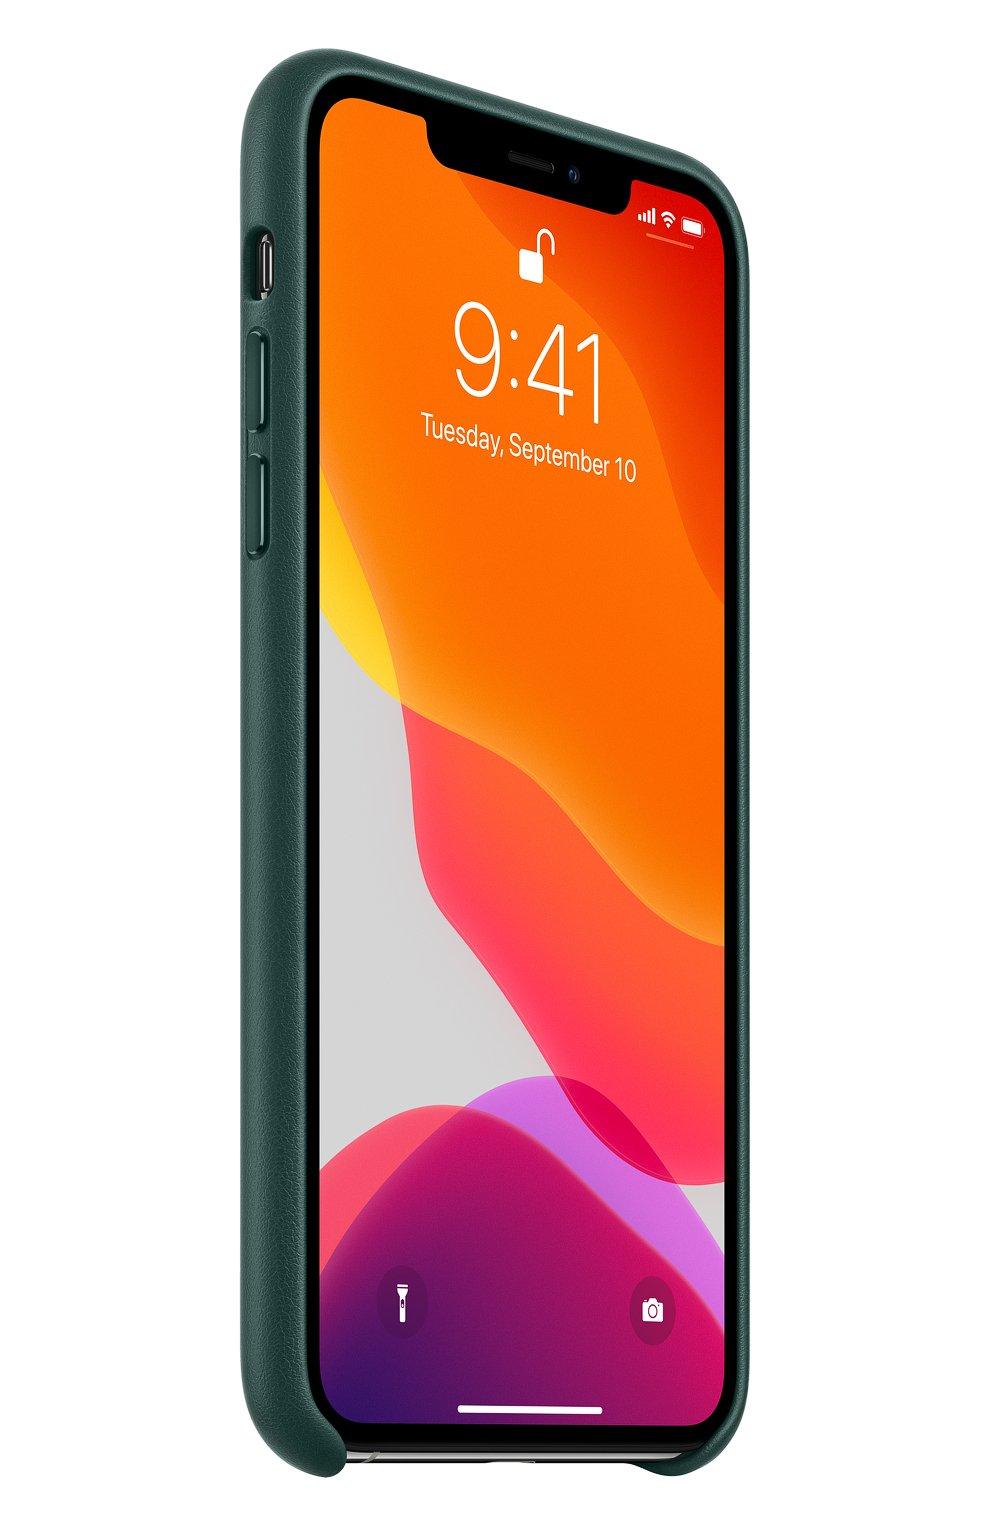 Кожаный чехол для iphone 11 pro max APPLE  темно-зеленого цвета, арт. MX0C2ZM/A | Фото 2